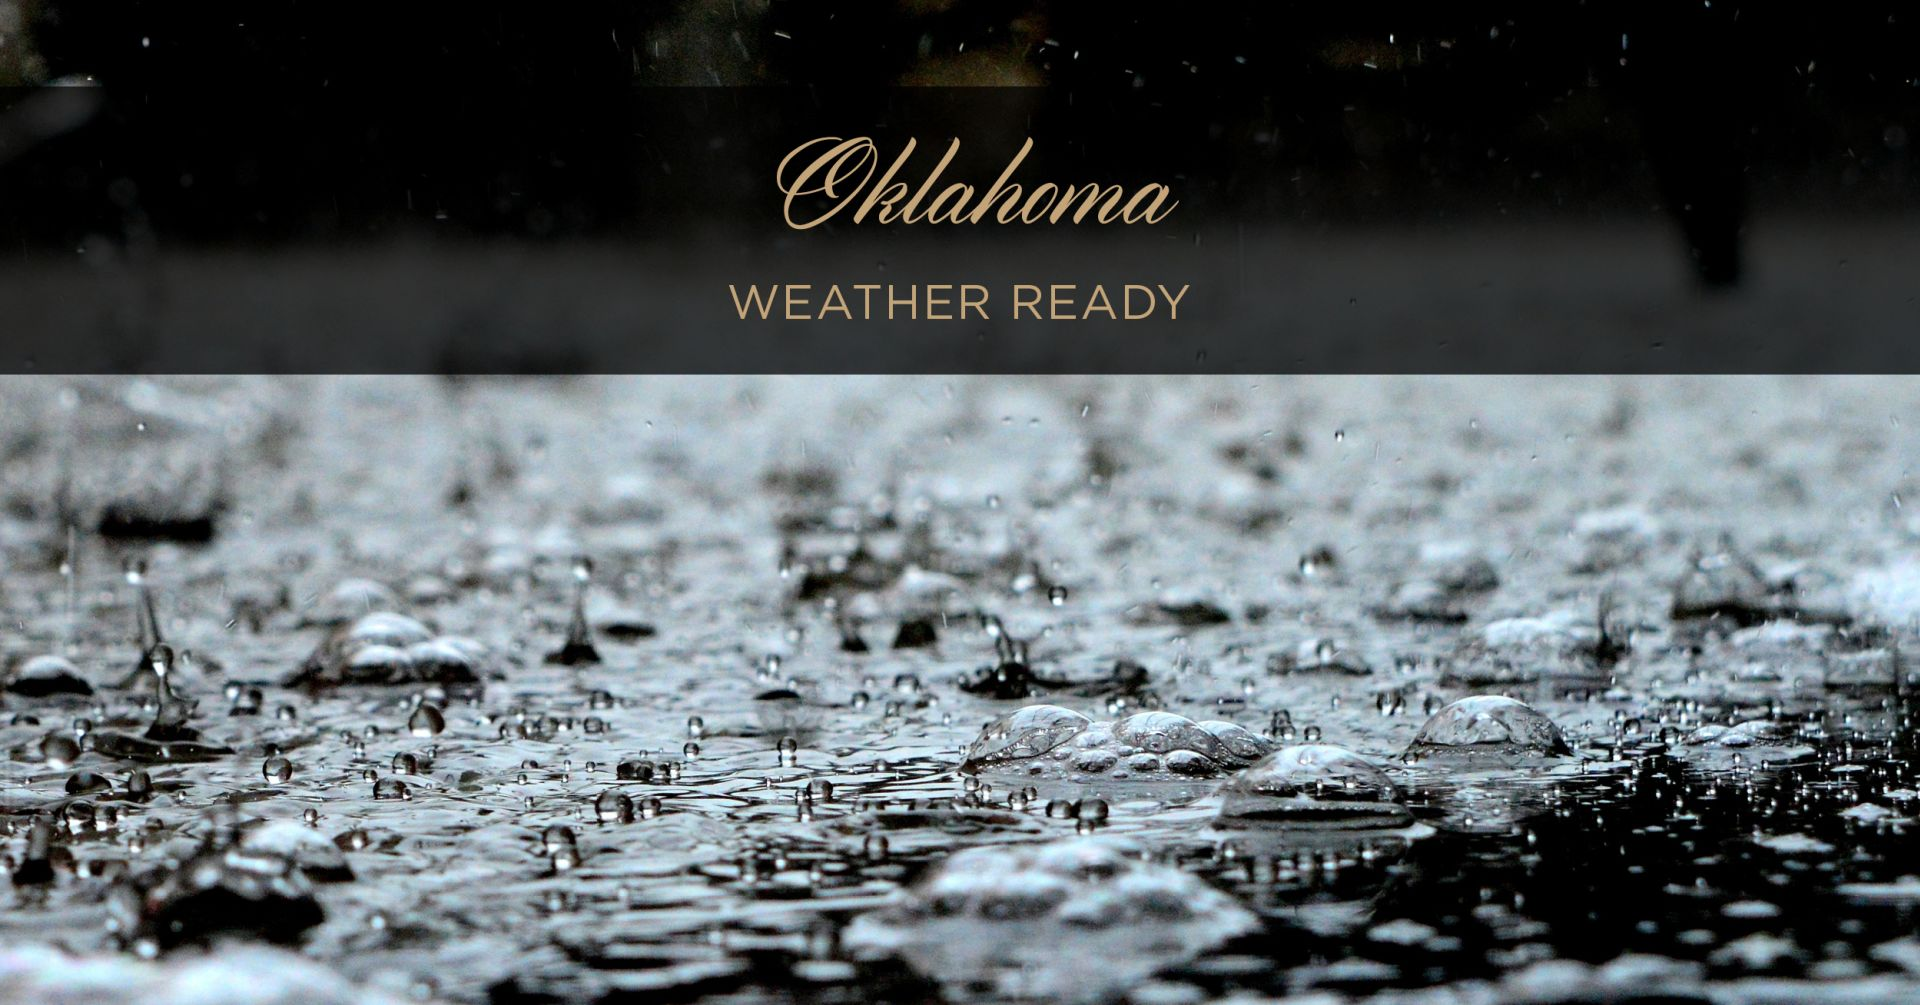 Oklahoma Weather Ready